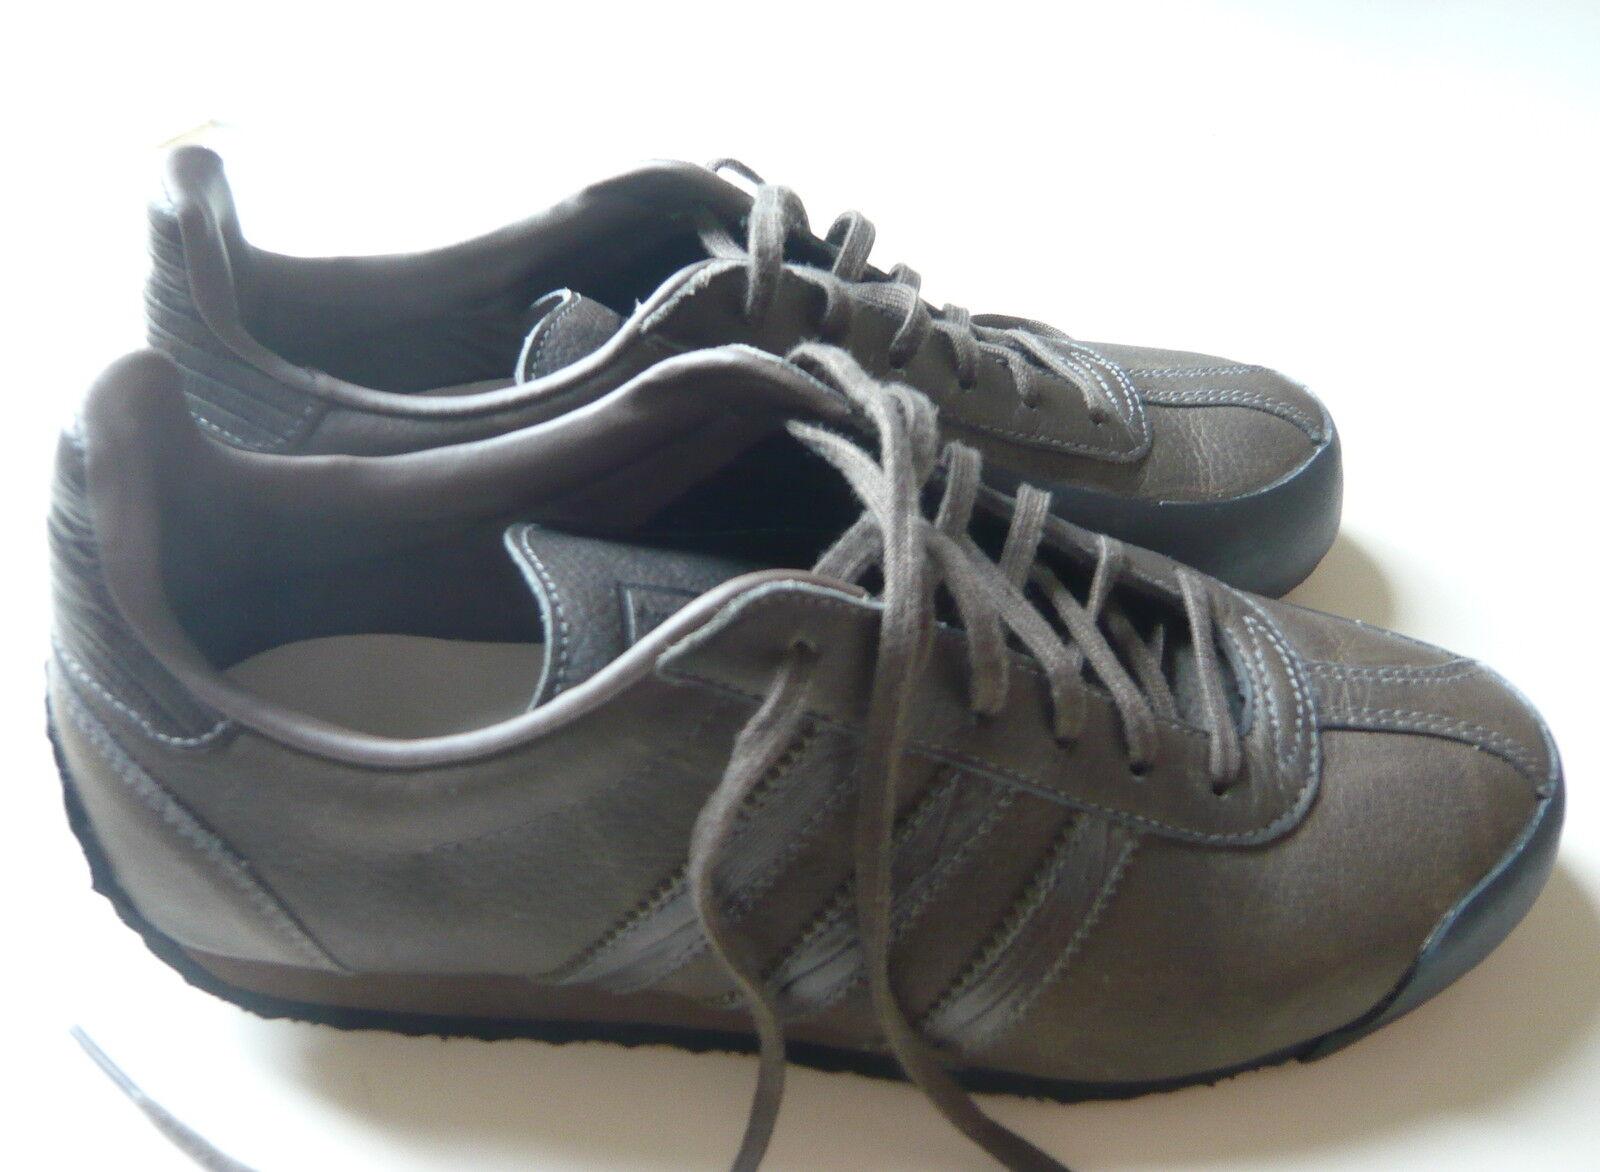 Adidas Lifestyle schwarz Fencing Lea M Sneakers Leder oliv Gummi schwarz Lifestyle Gr. 38 Schuhe 290429